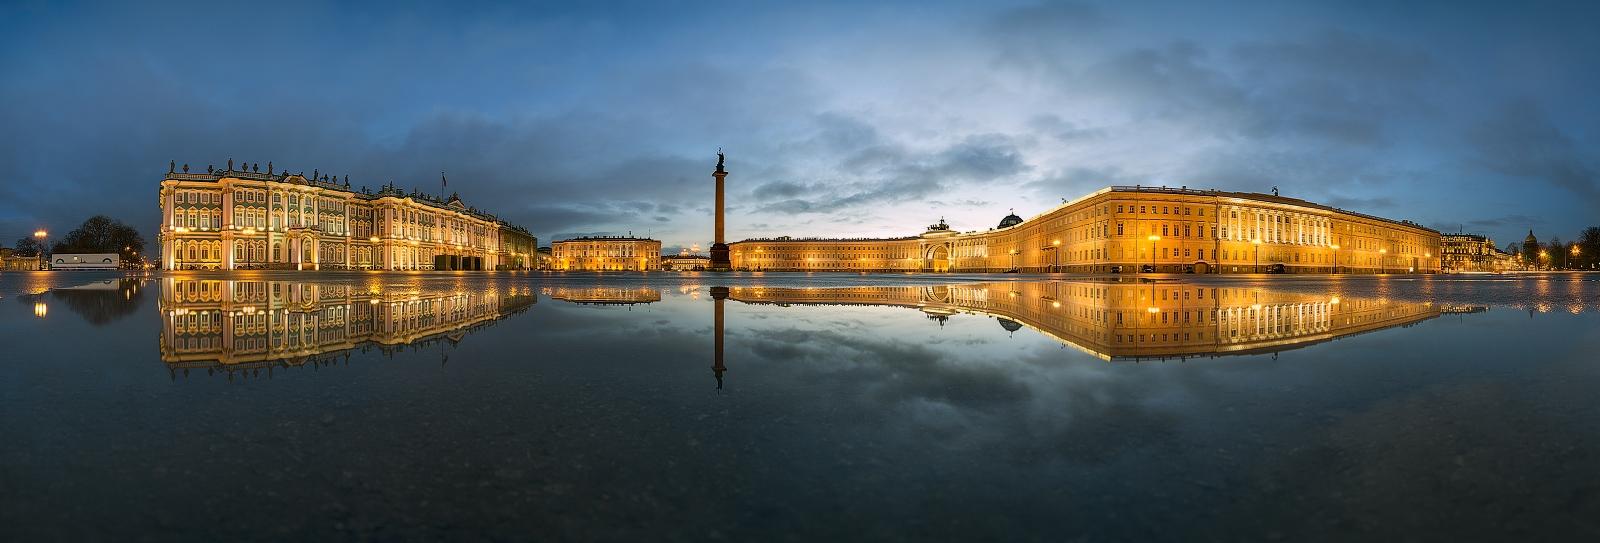 Night Saint Petersburg: Amazing photos of the city by Sergey Louks - 34